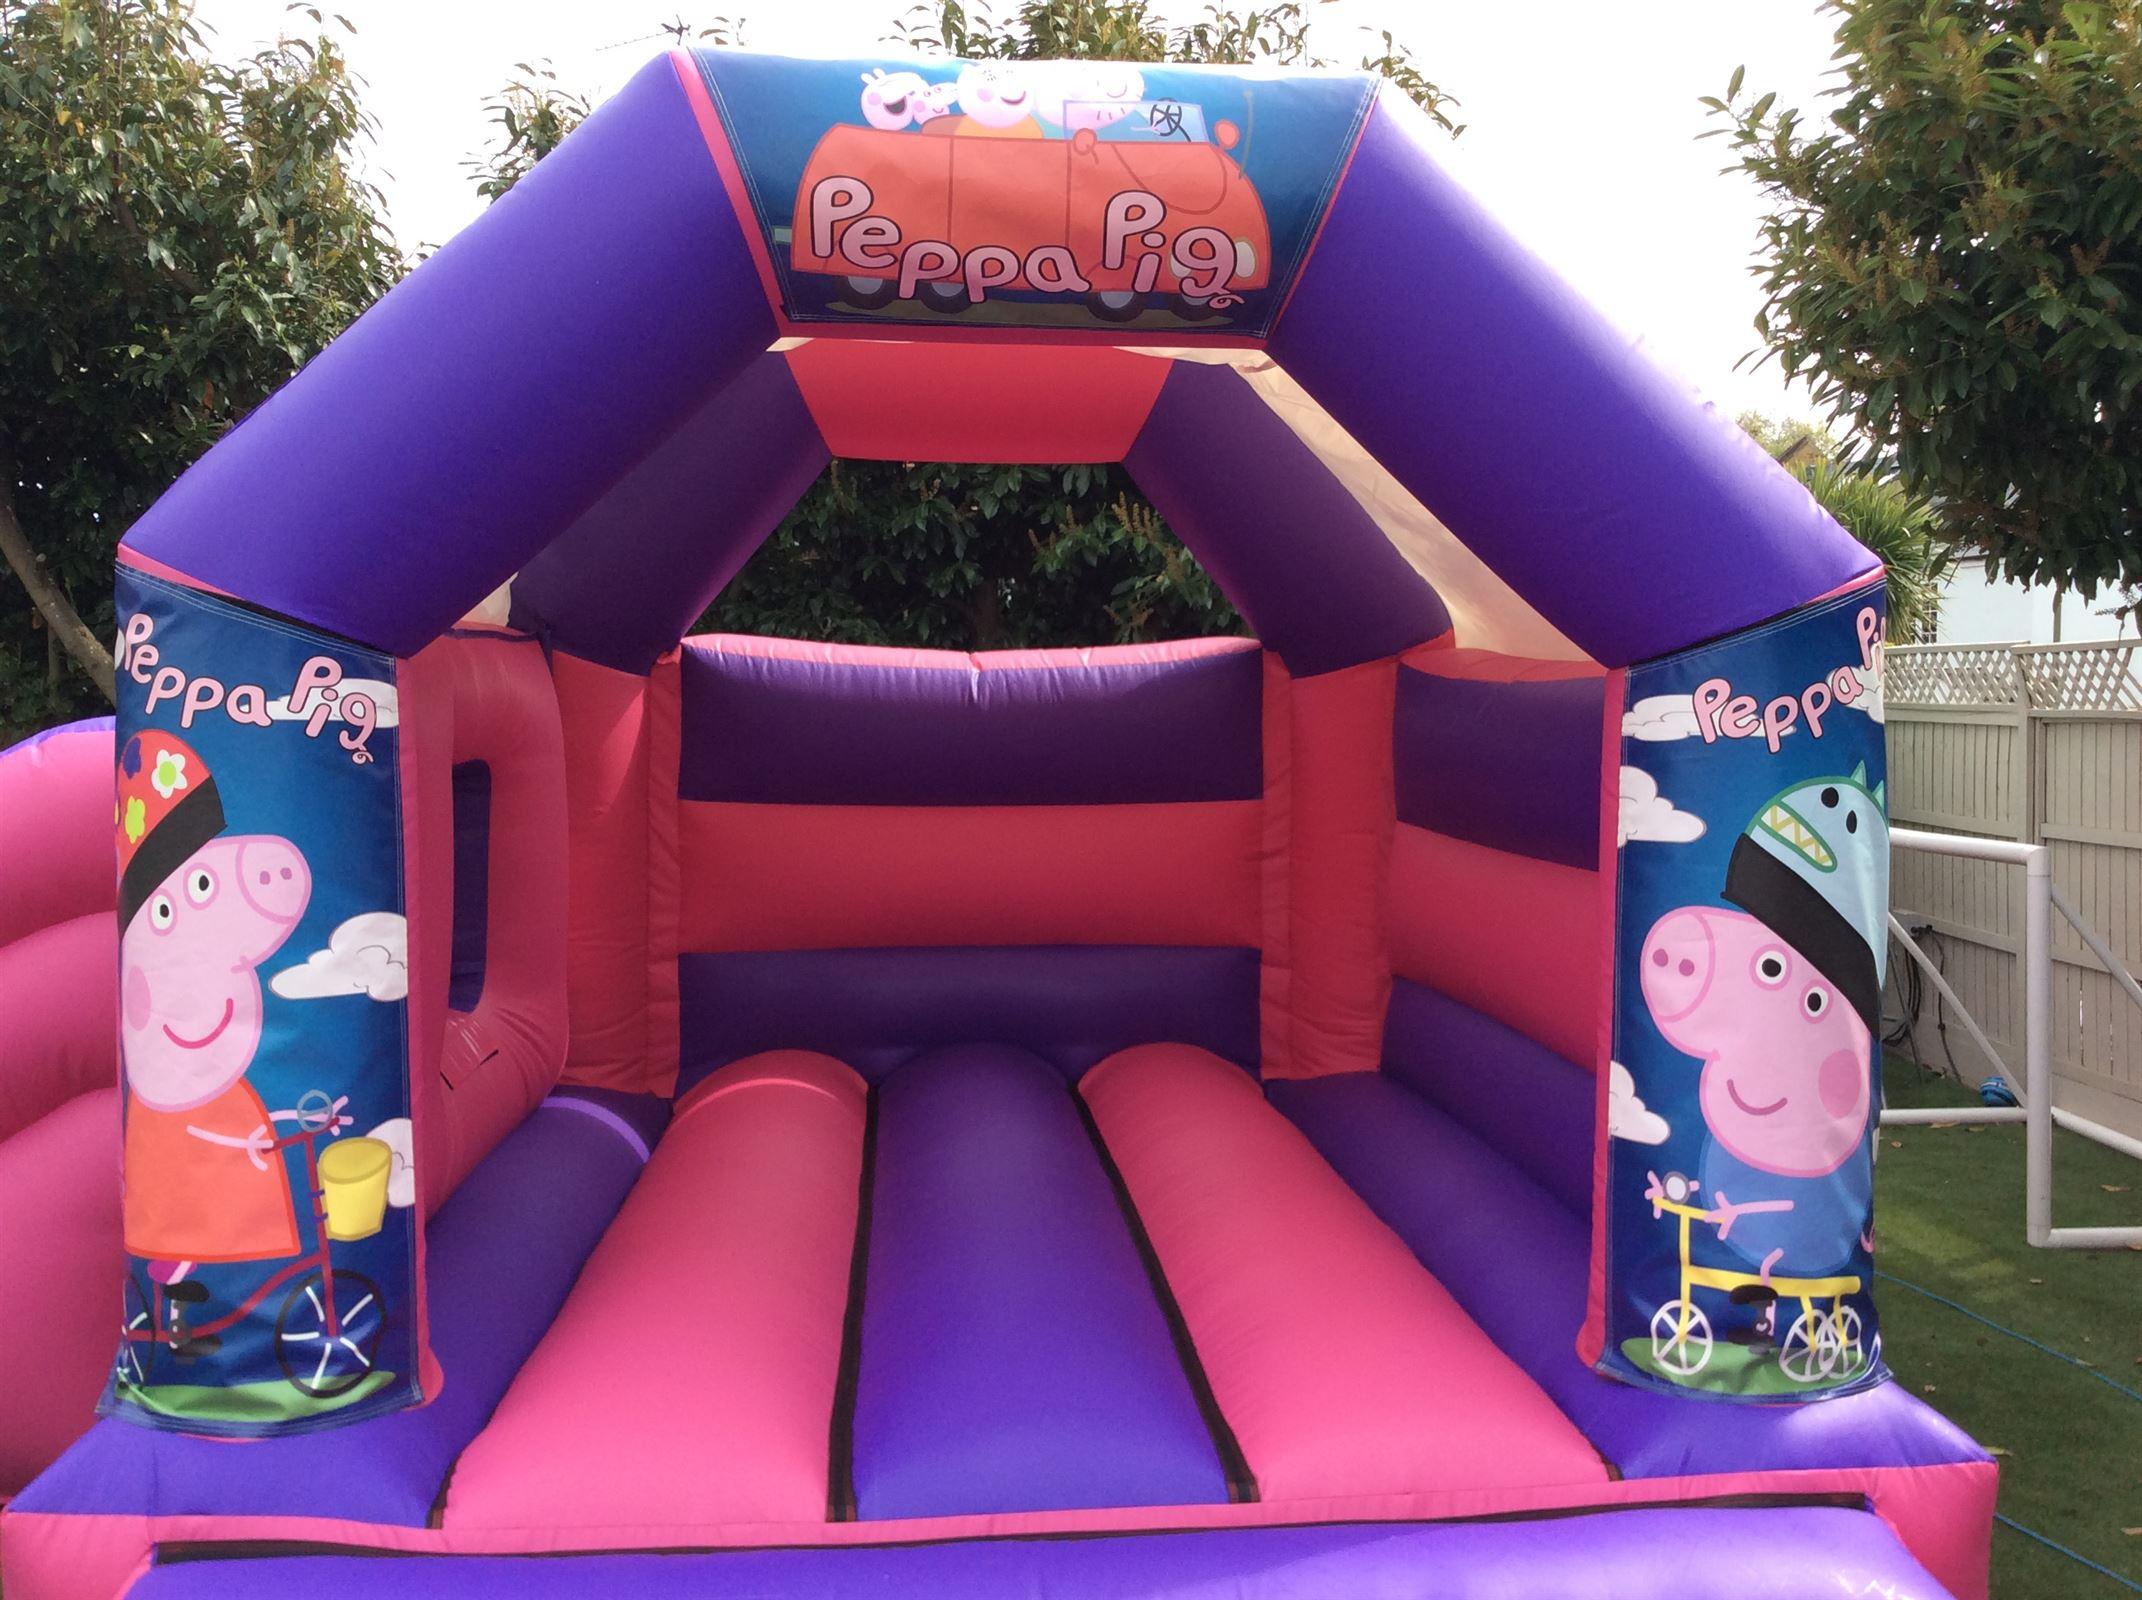 Peppa Pig Bouncy Castle 16ft Vs 15ft Bouncy Castle Hire